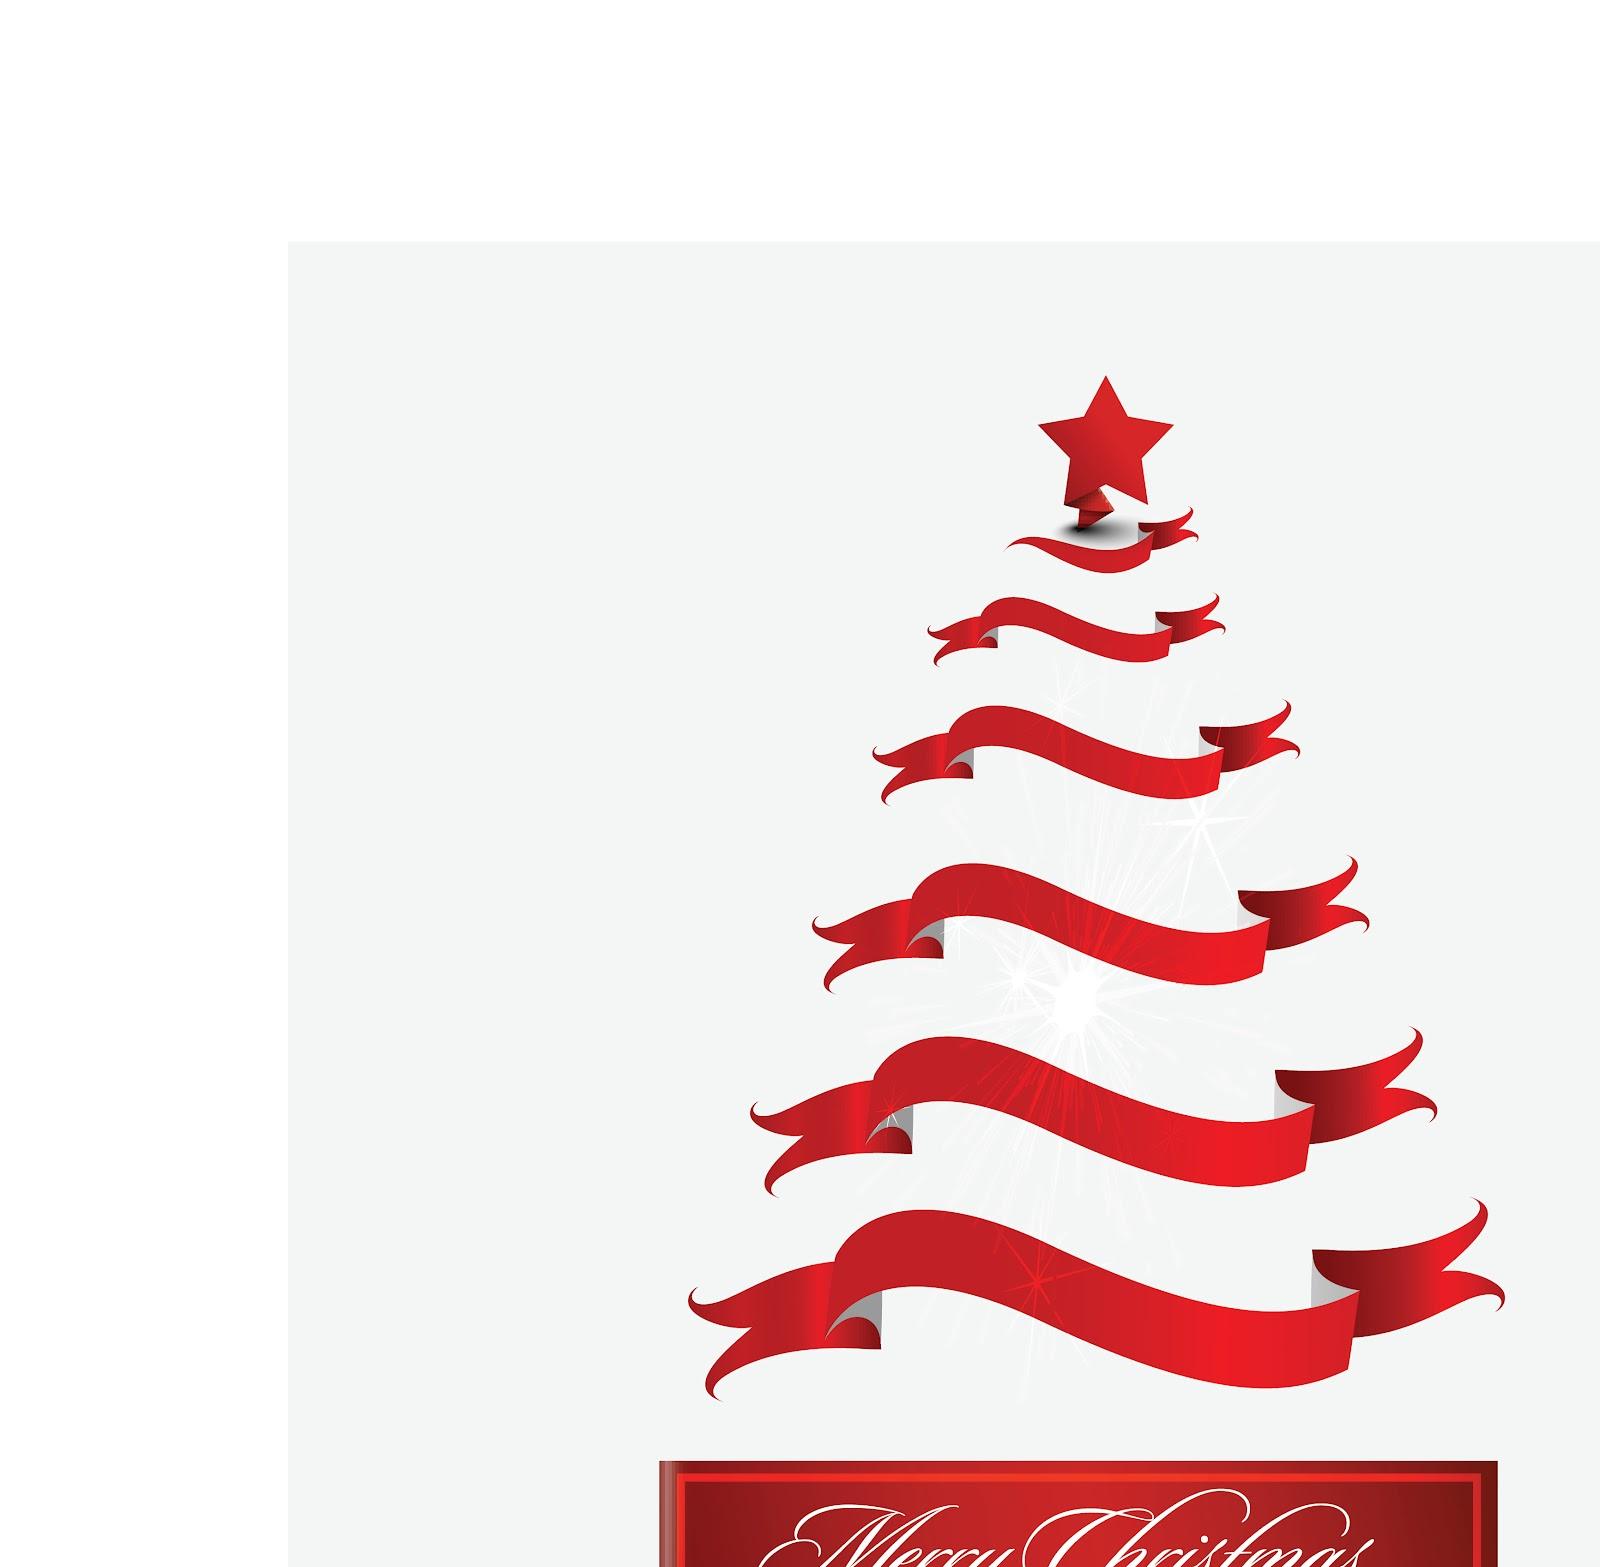 Christmas Tree Merry Christmas: INeed Files Collection: Merry Christmas Retro Template